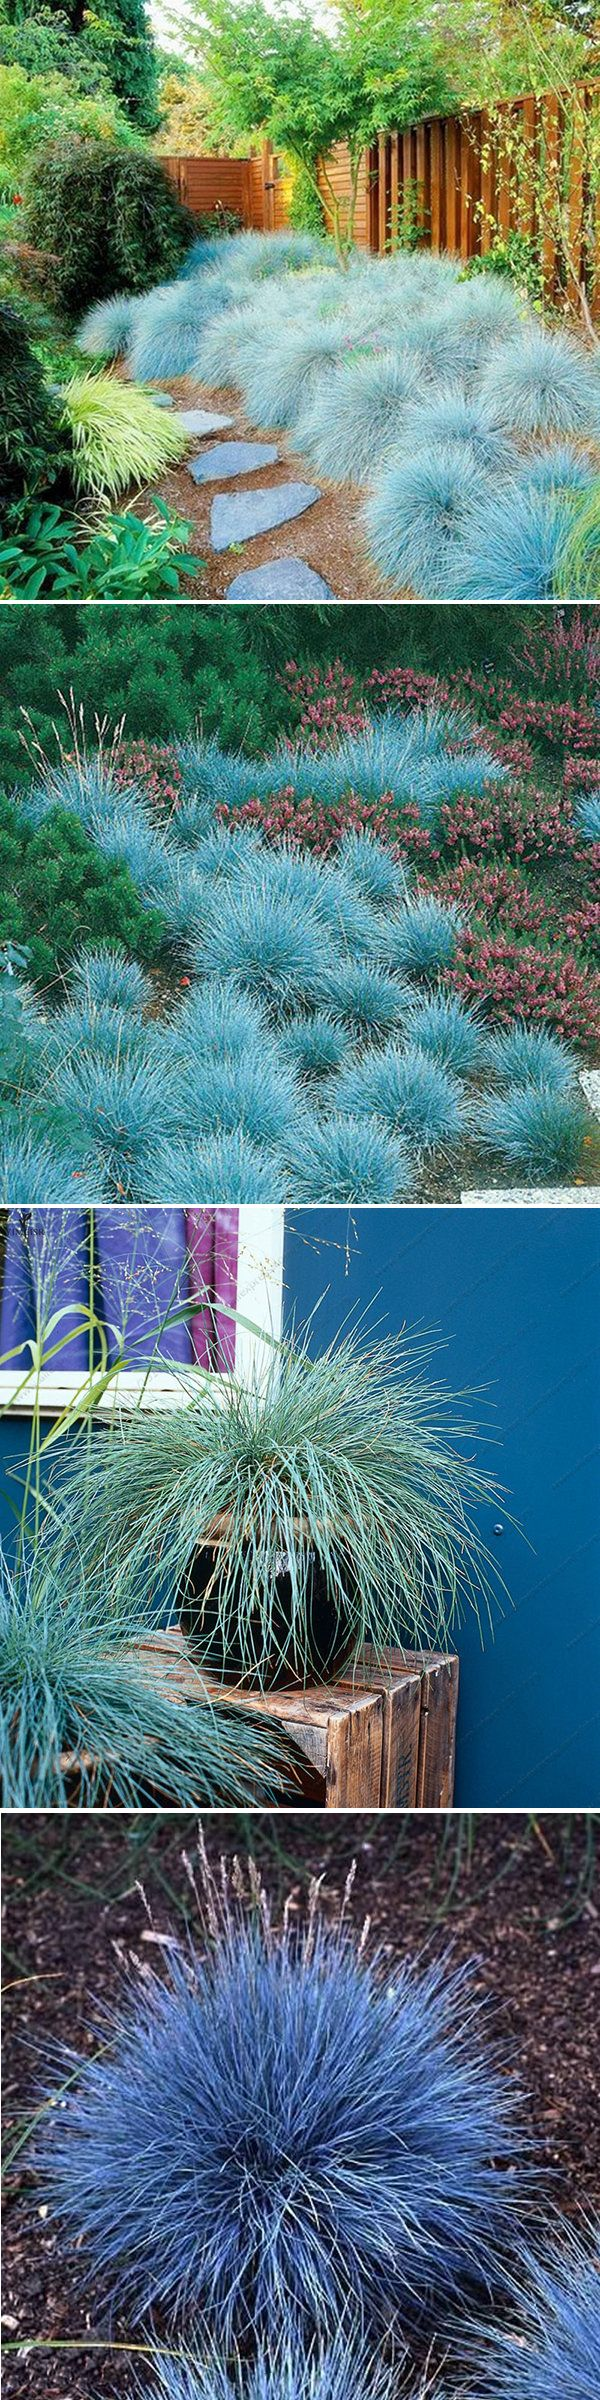 # Perennial / #Ornamental #Grasses    http://dennisharper.lnf.com/